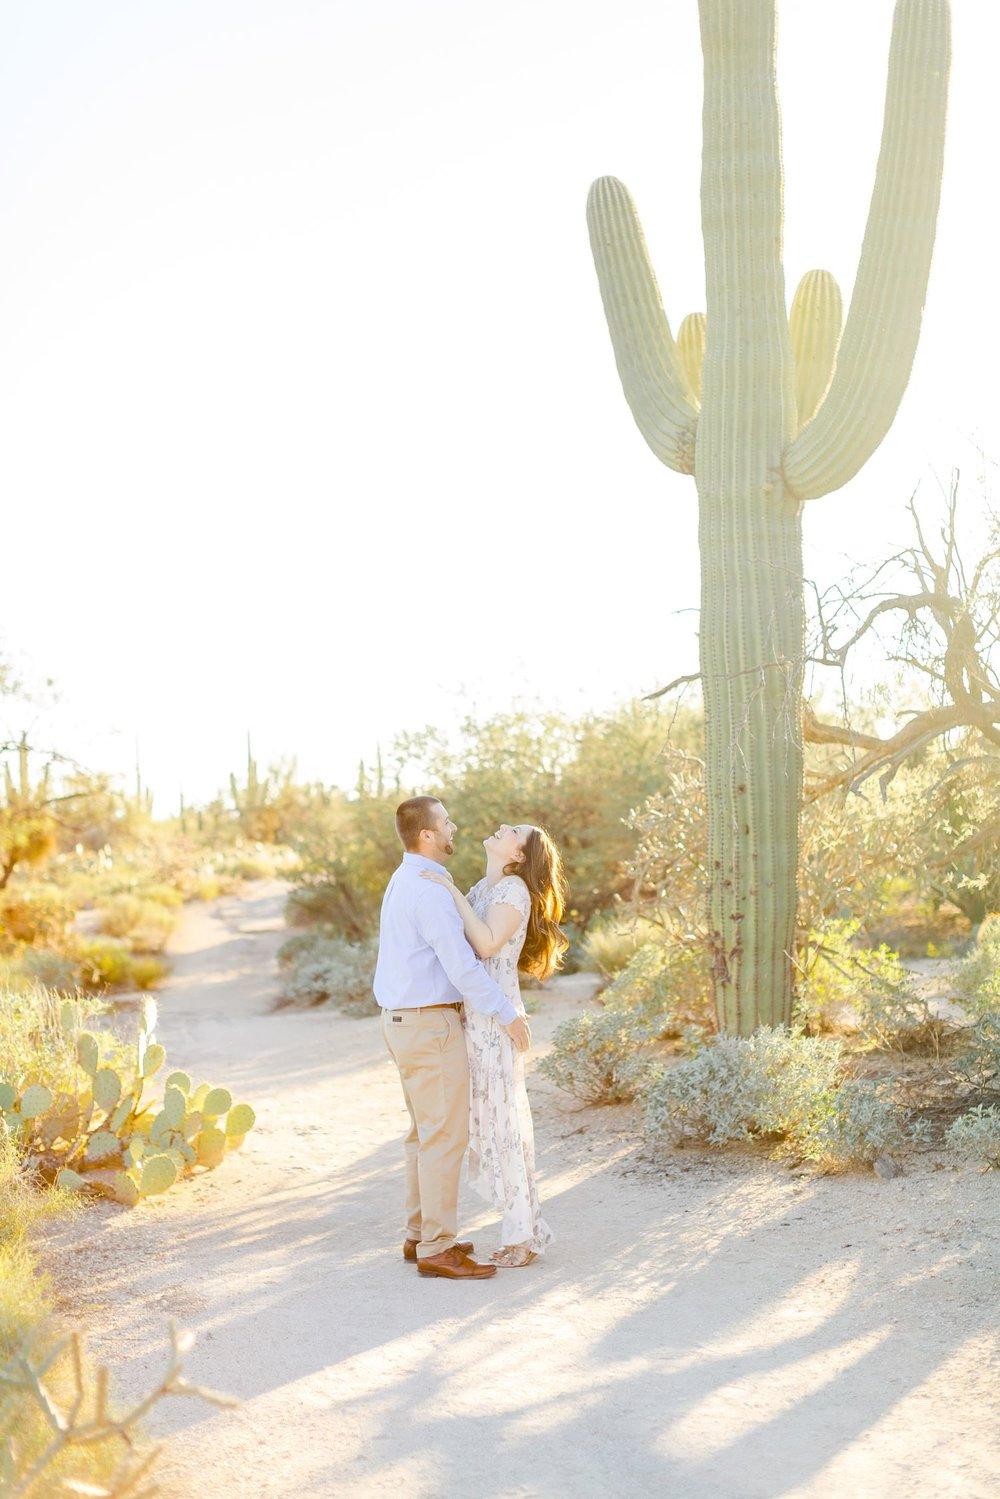 desert engagement photos tucson arizona